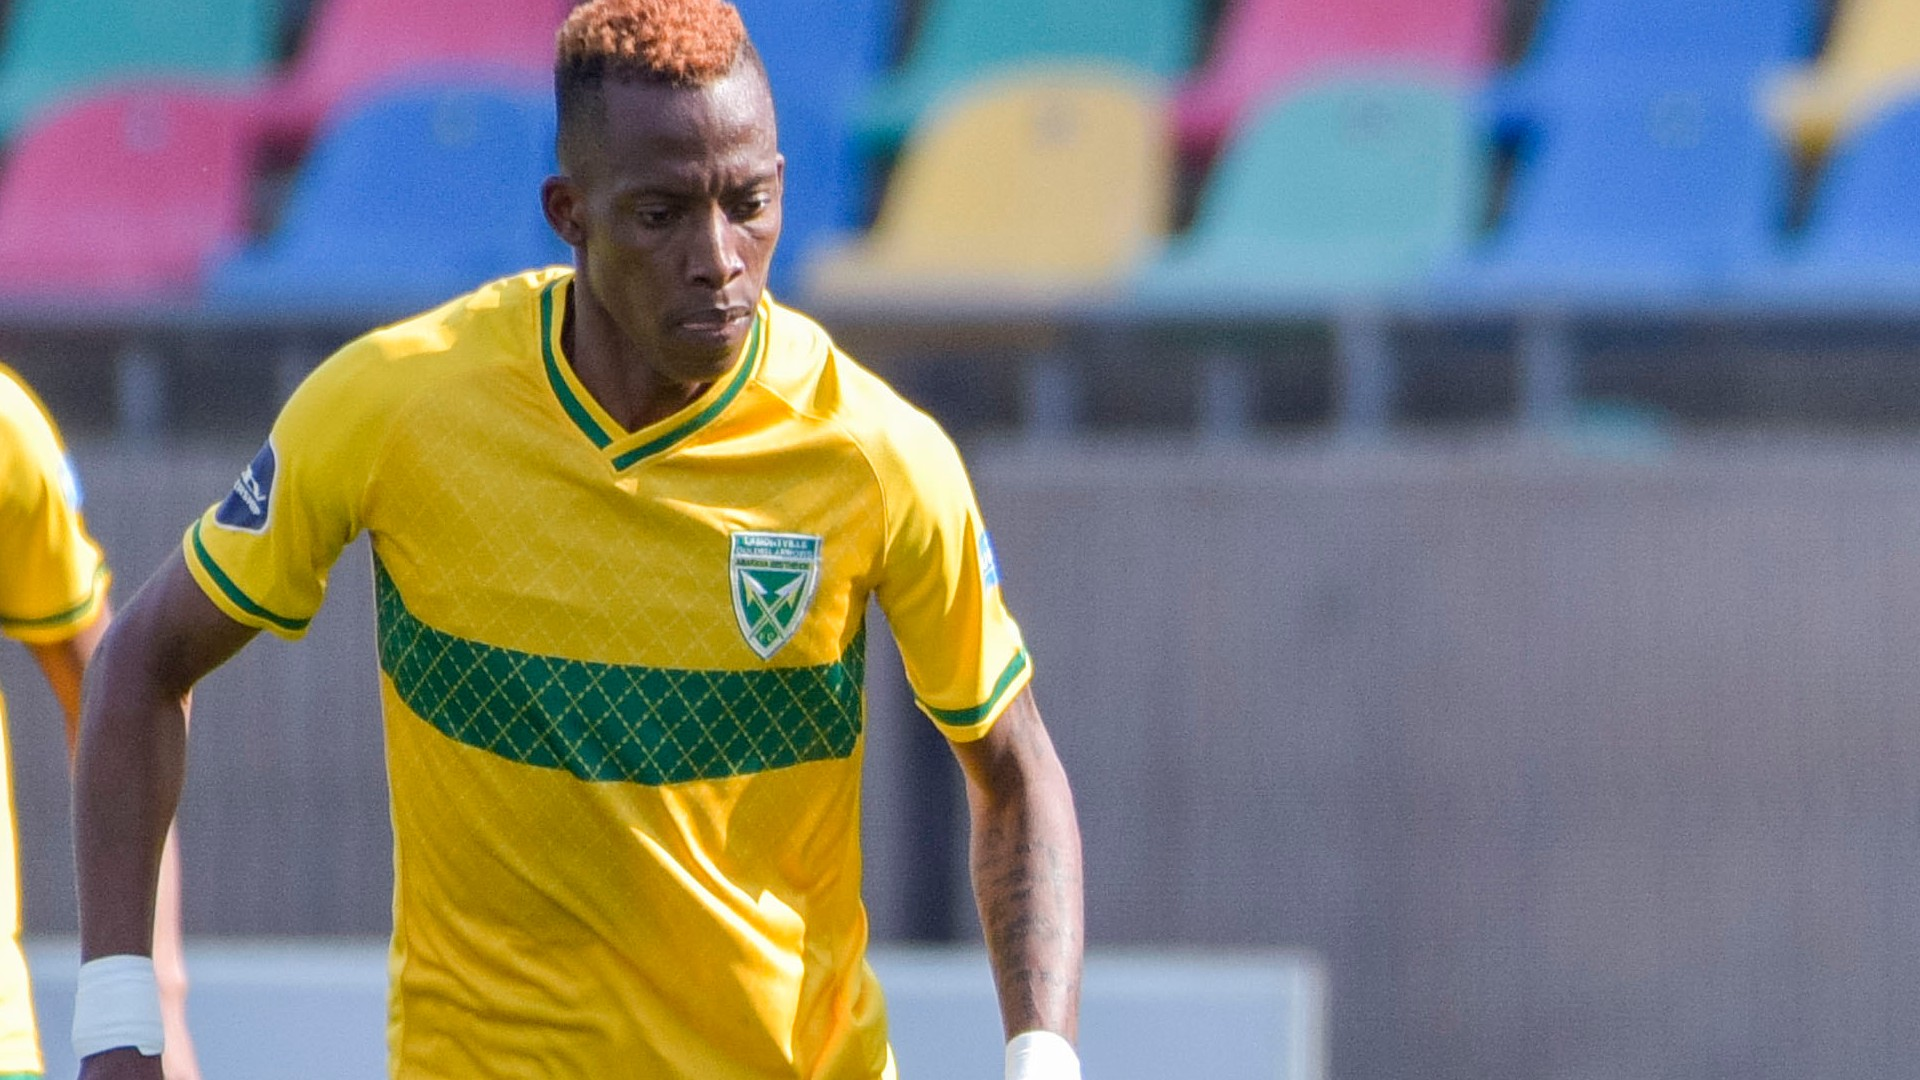 Mamelodi Sundowns' Lunga put Salah in his pocket and that helped us profile him - Mokwena